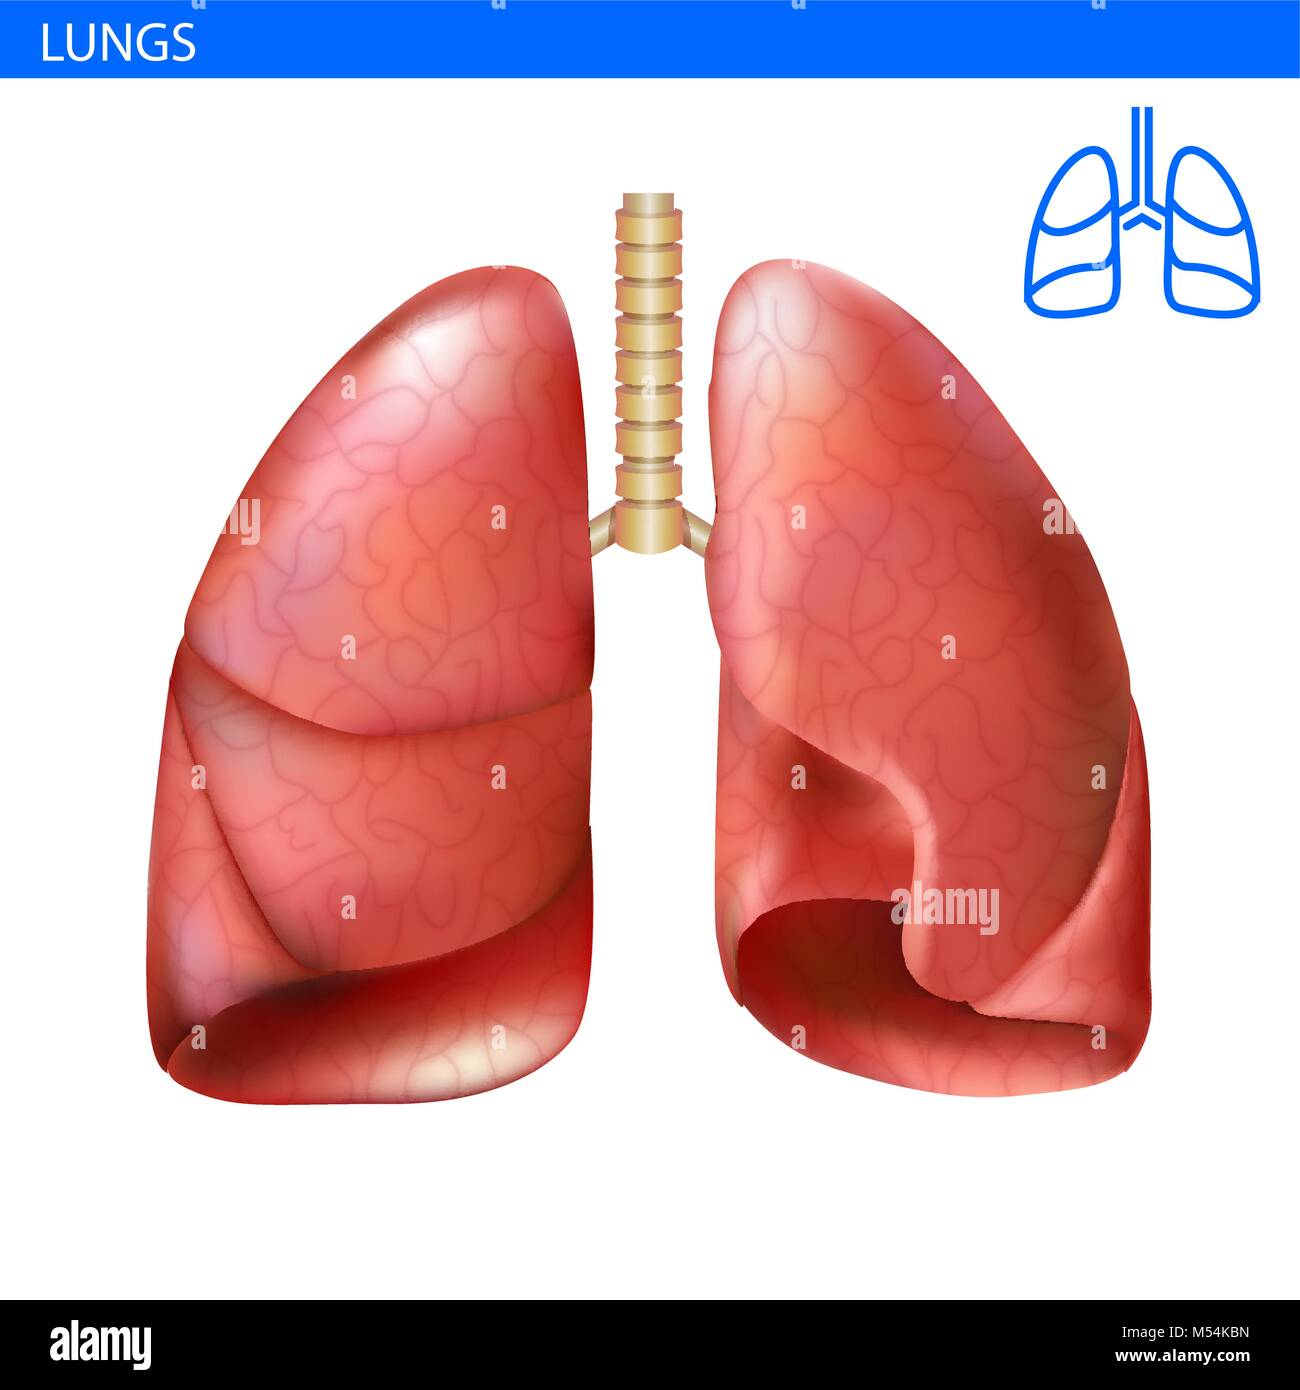 Pneumonia Lung Imágenes De Stock & Pneumonia Lung Fotos De Stock ...